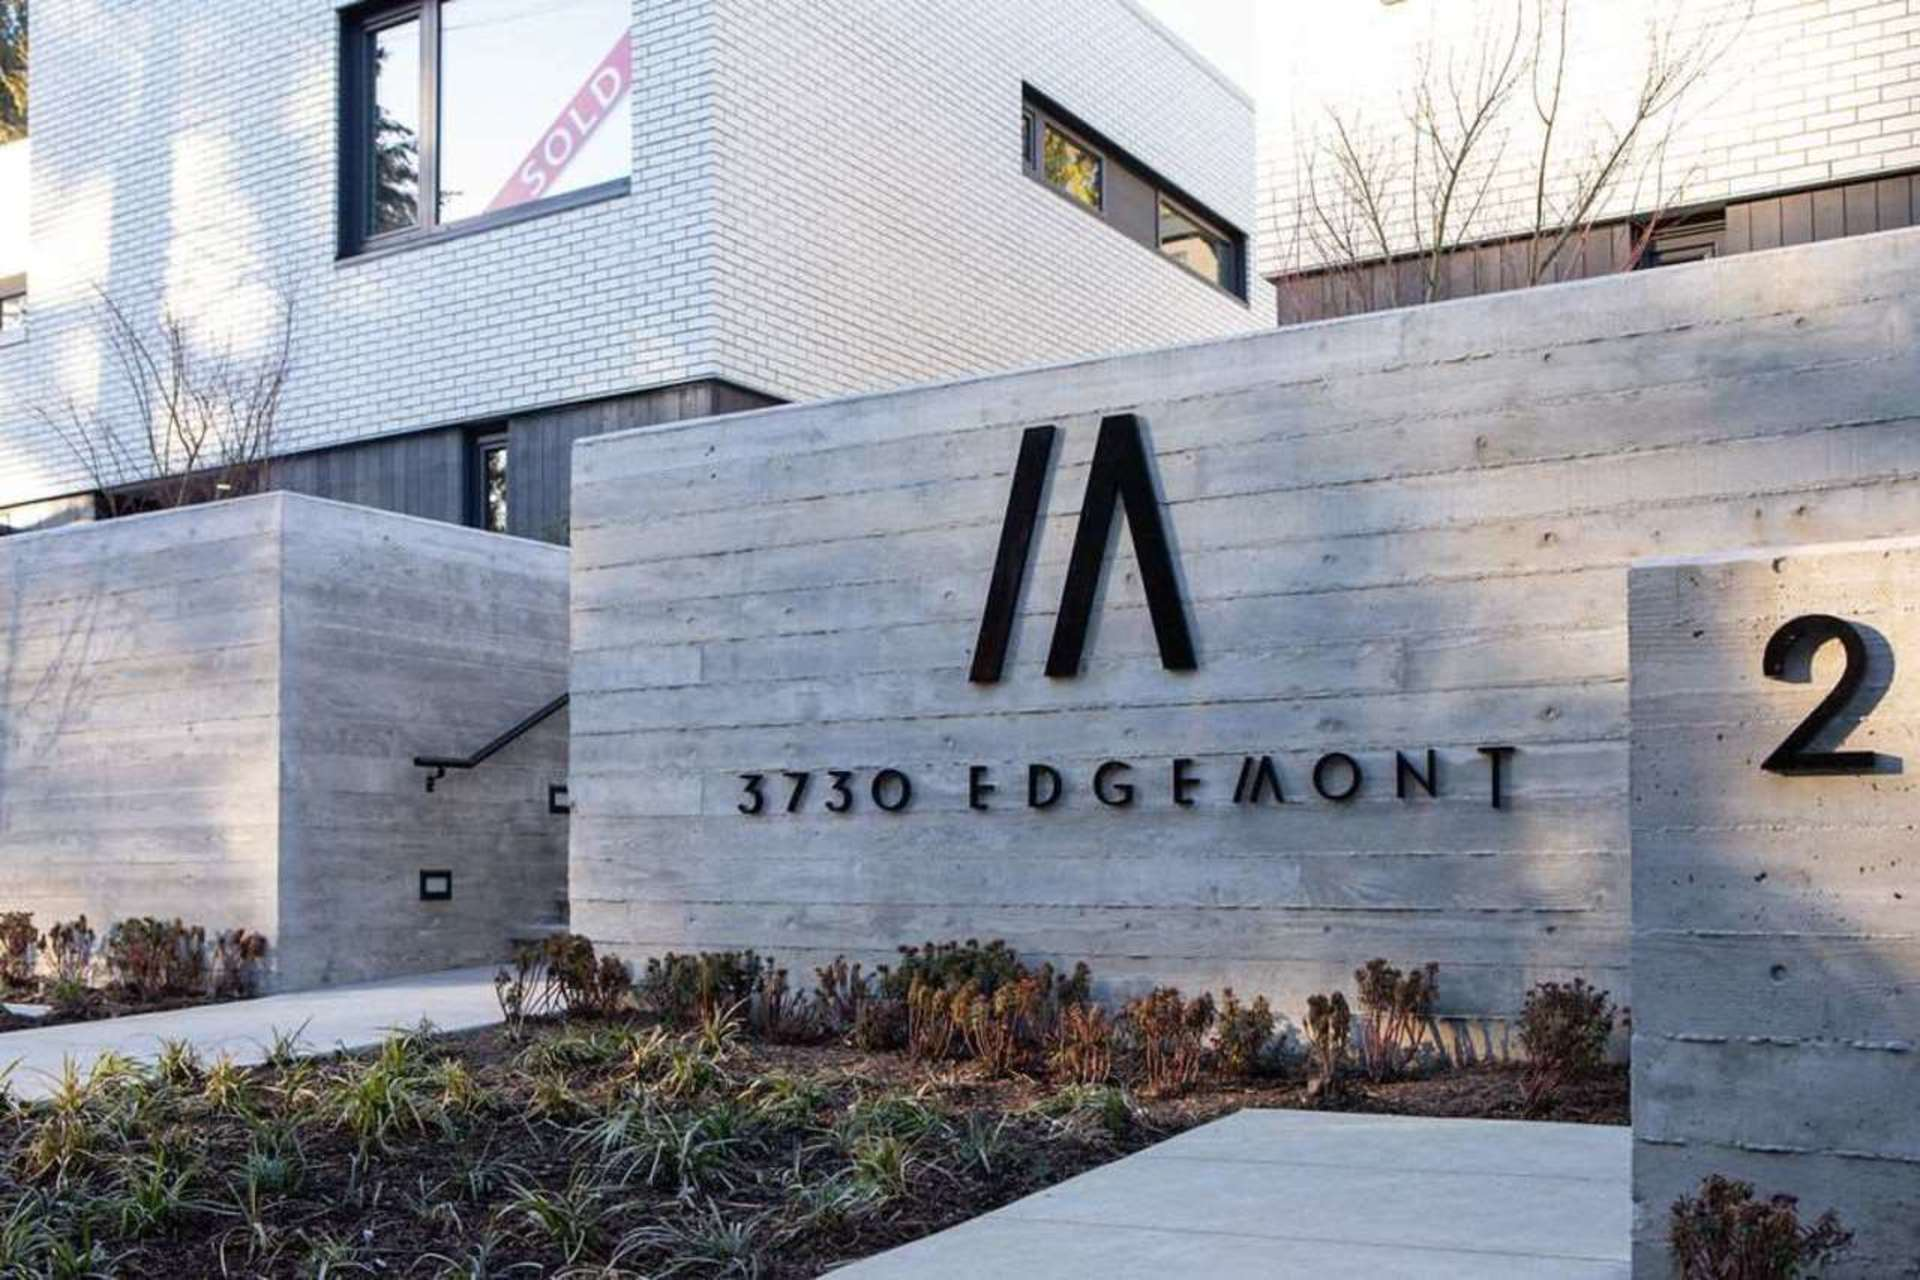 3730-edgemont-boulevard-edgemont-north-vancouver-02 at 5 - 3730 Edgemont Boulevard, Edgemont, North Vancouver